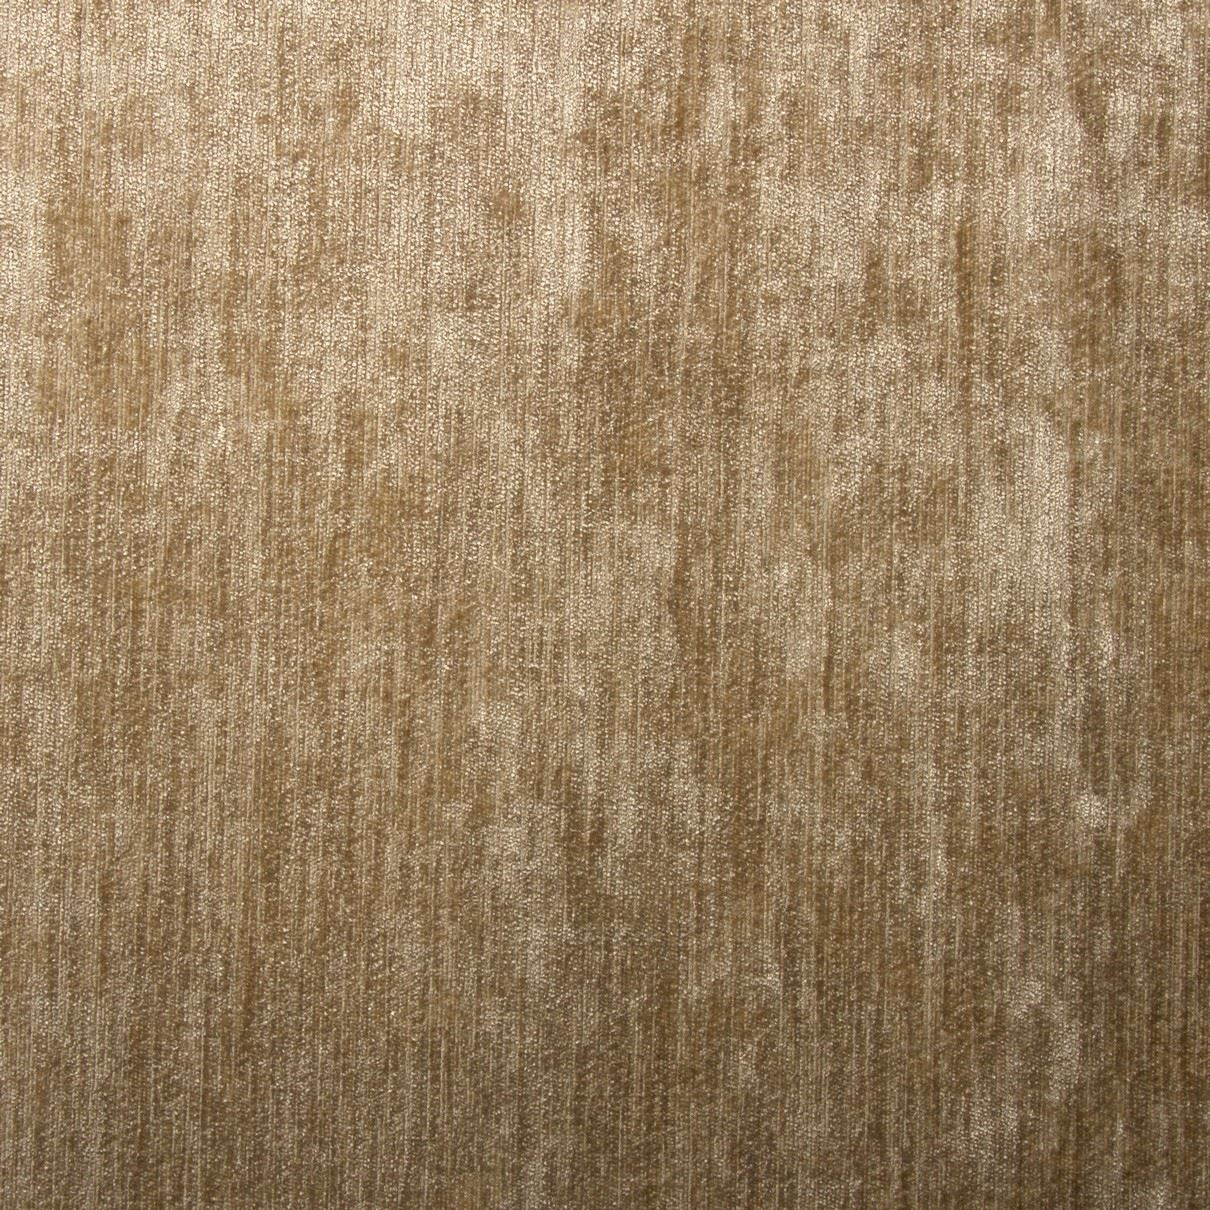 thumbnail 4 - LUXURY PLUSH CRUSHED SATIN VELVET SUPER SOFT HEAVY WEIGHT UPHOLSTERY FABRIC